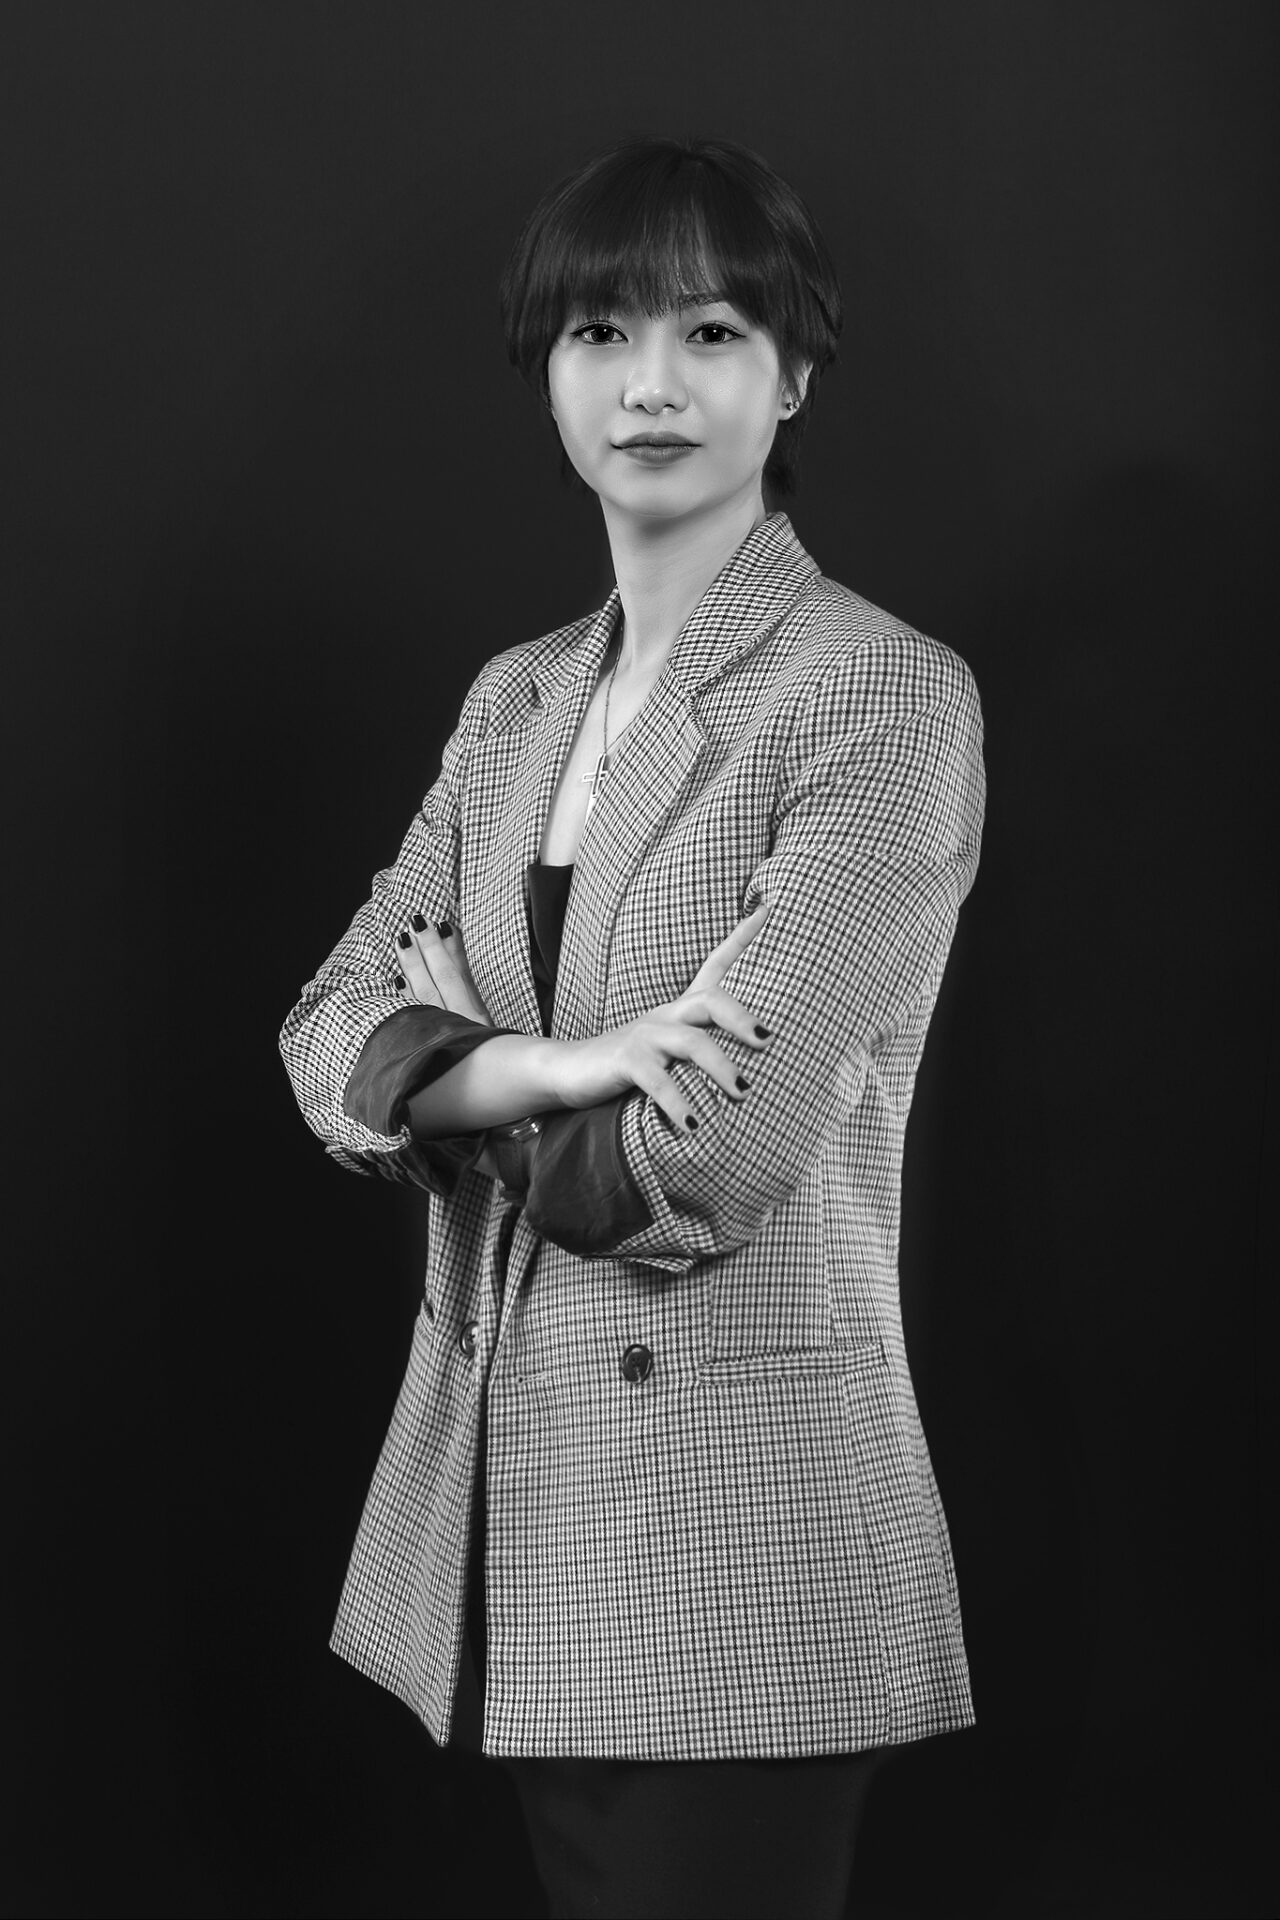 Mrs. Phuong Thao Dao